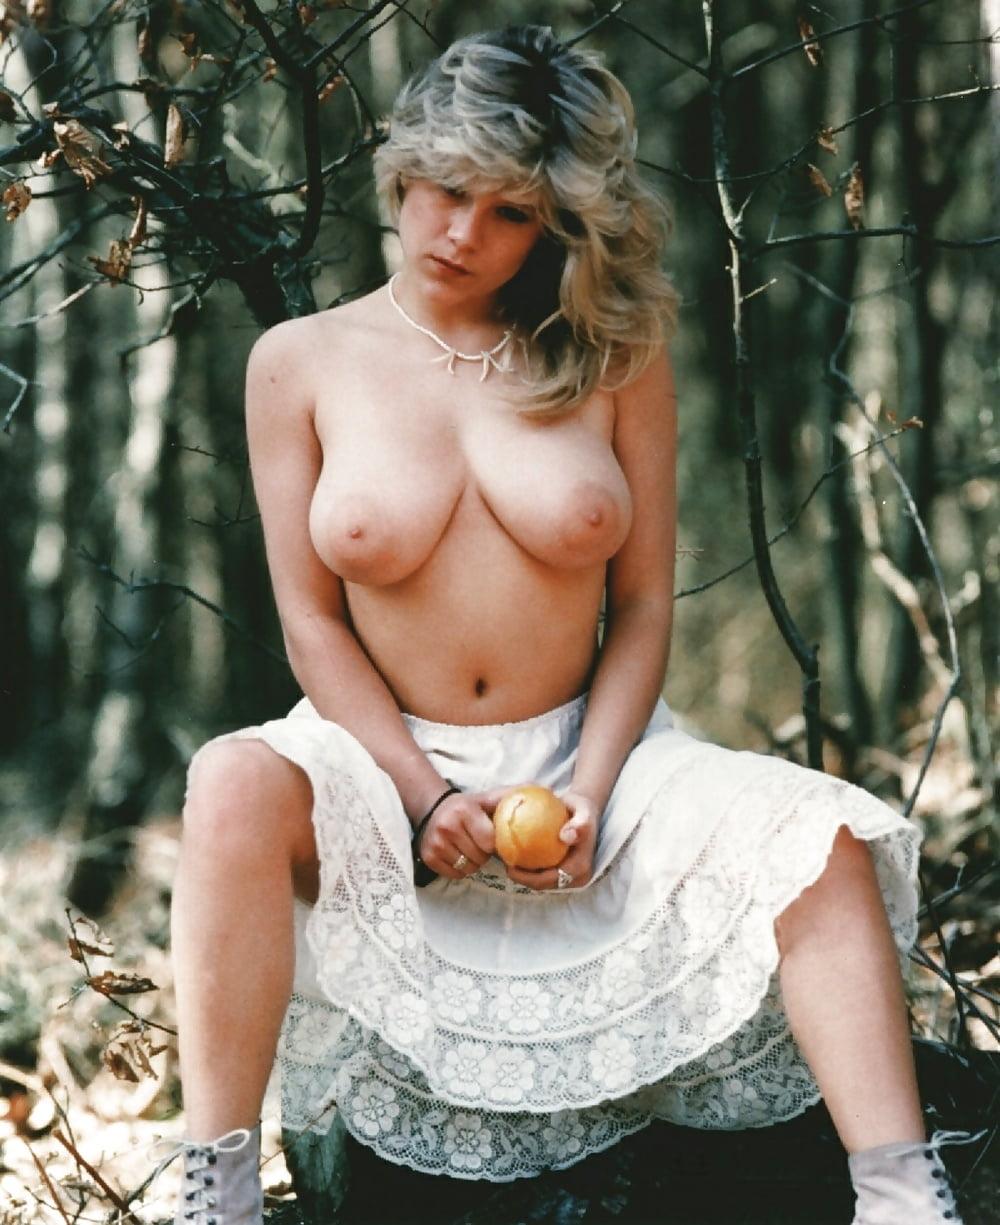 ero-foto-samanta-porno-onlayn-s-realistichnie-seks-kukli